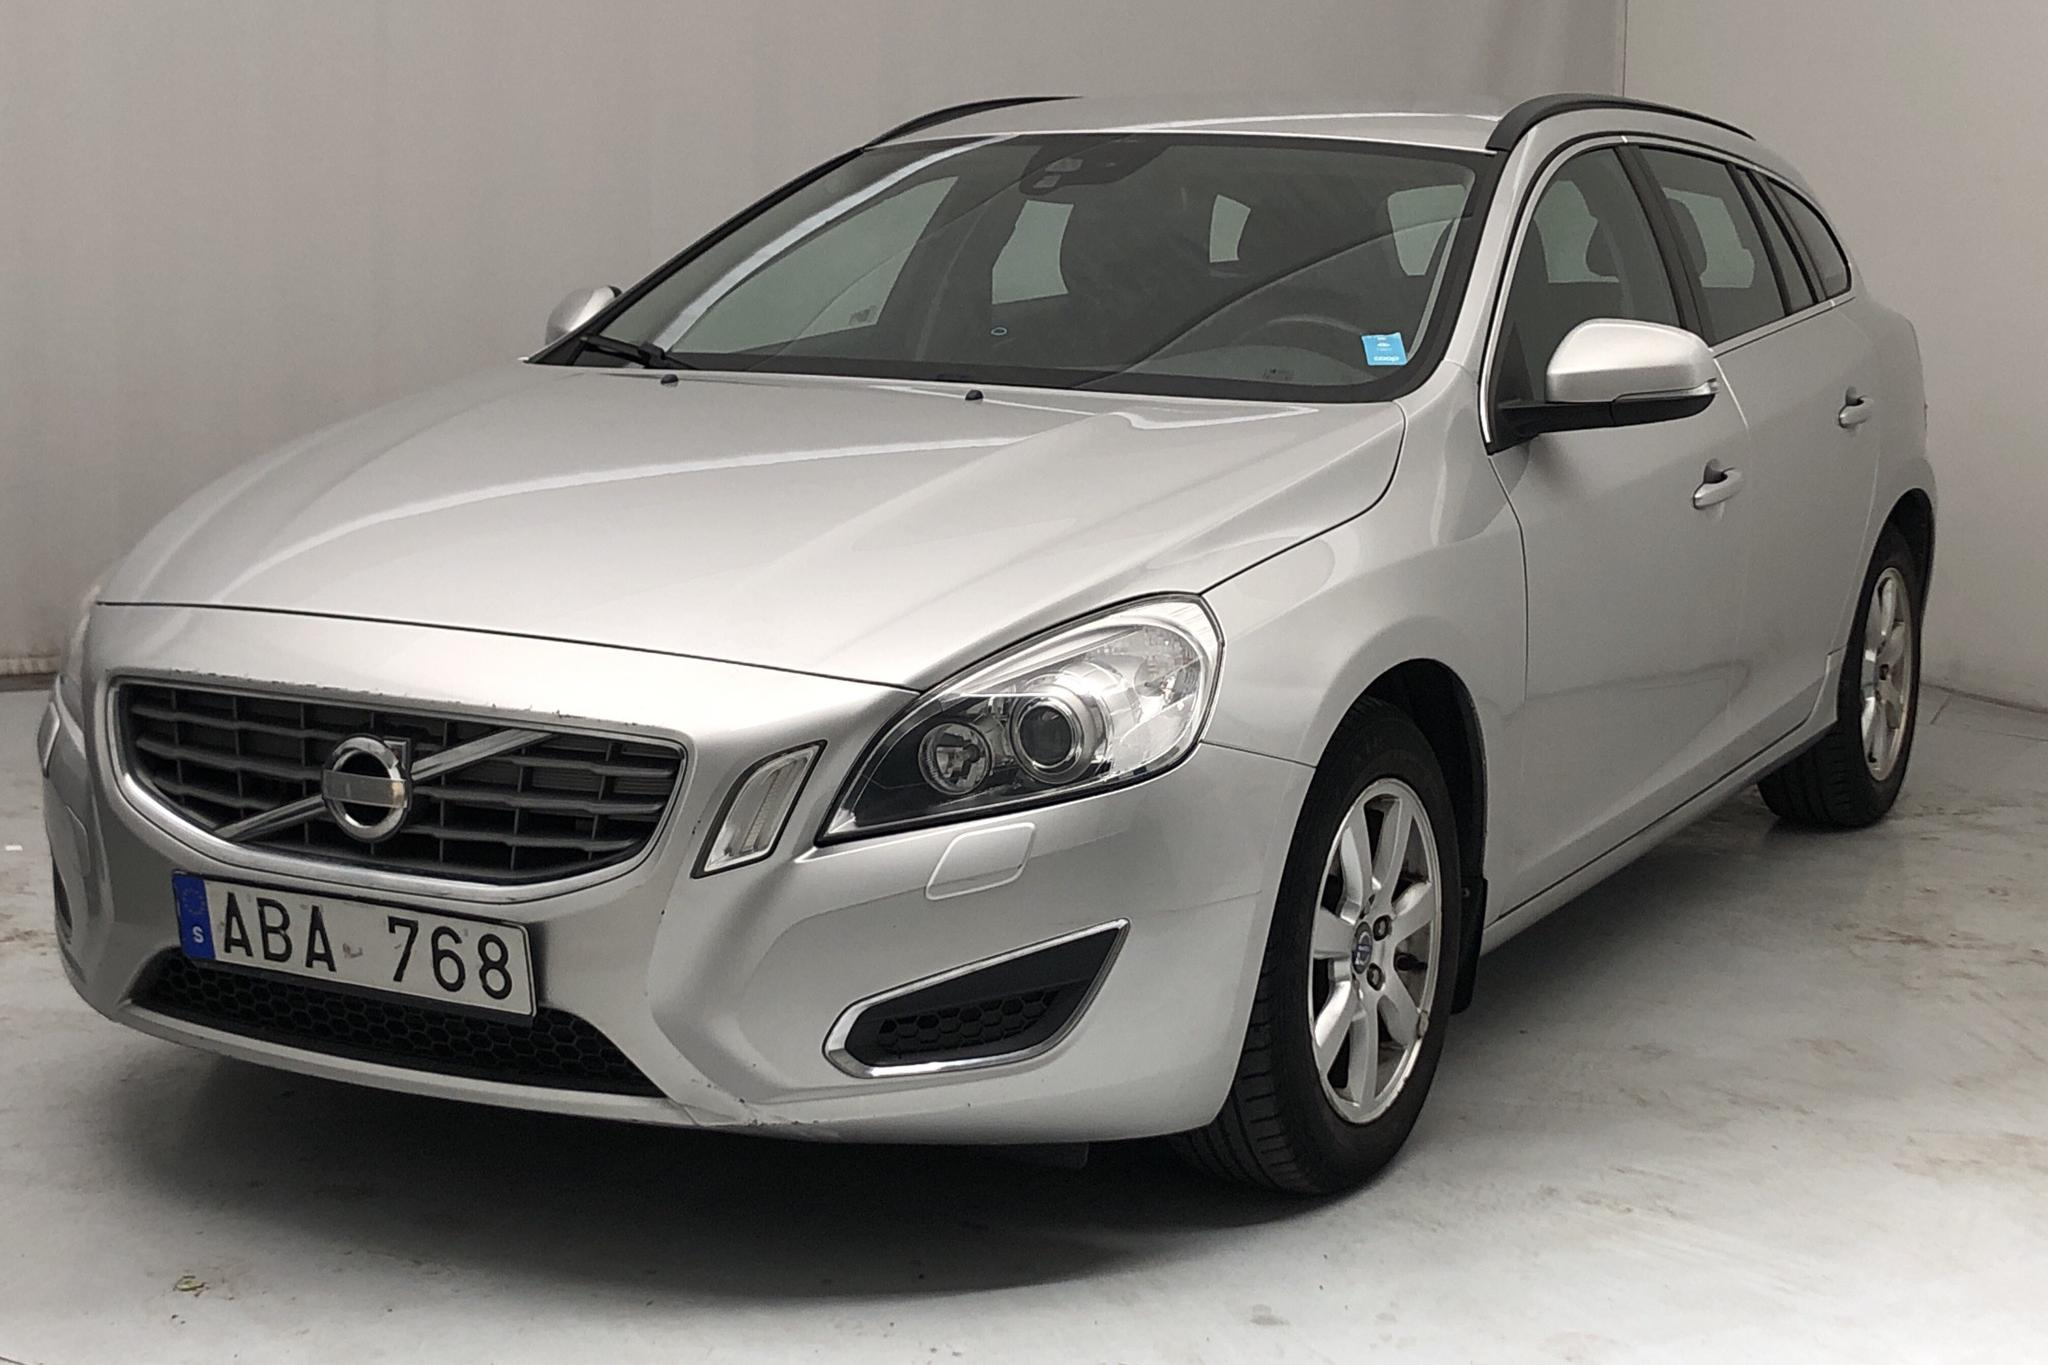 Volvo V60 1.6D DRIVe (115hk) - 16 123 mil - Manuell - Light Grey - 2012